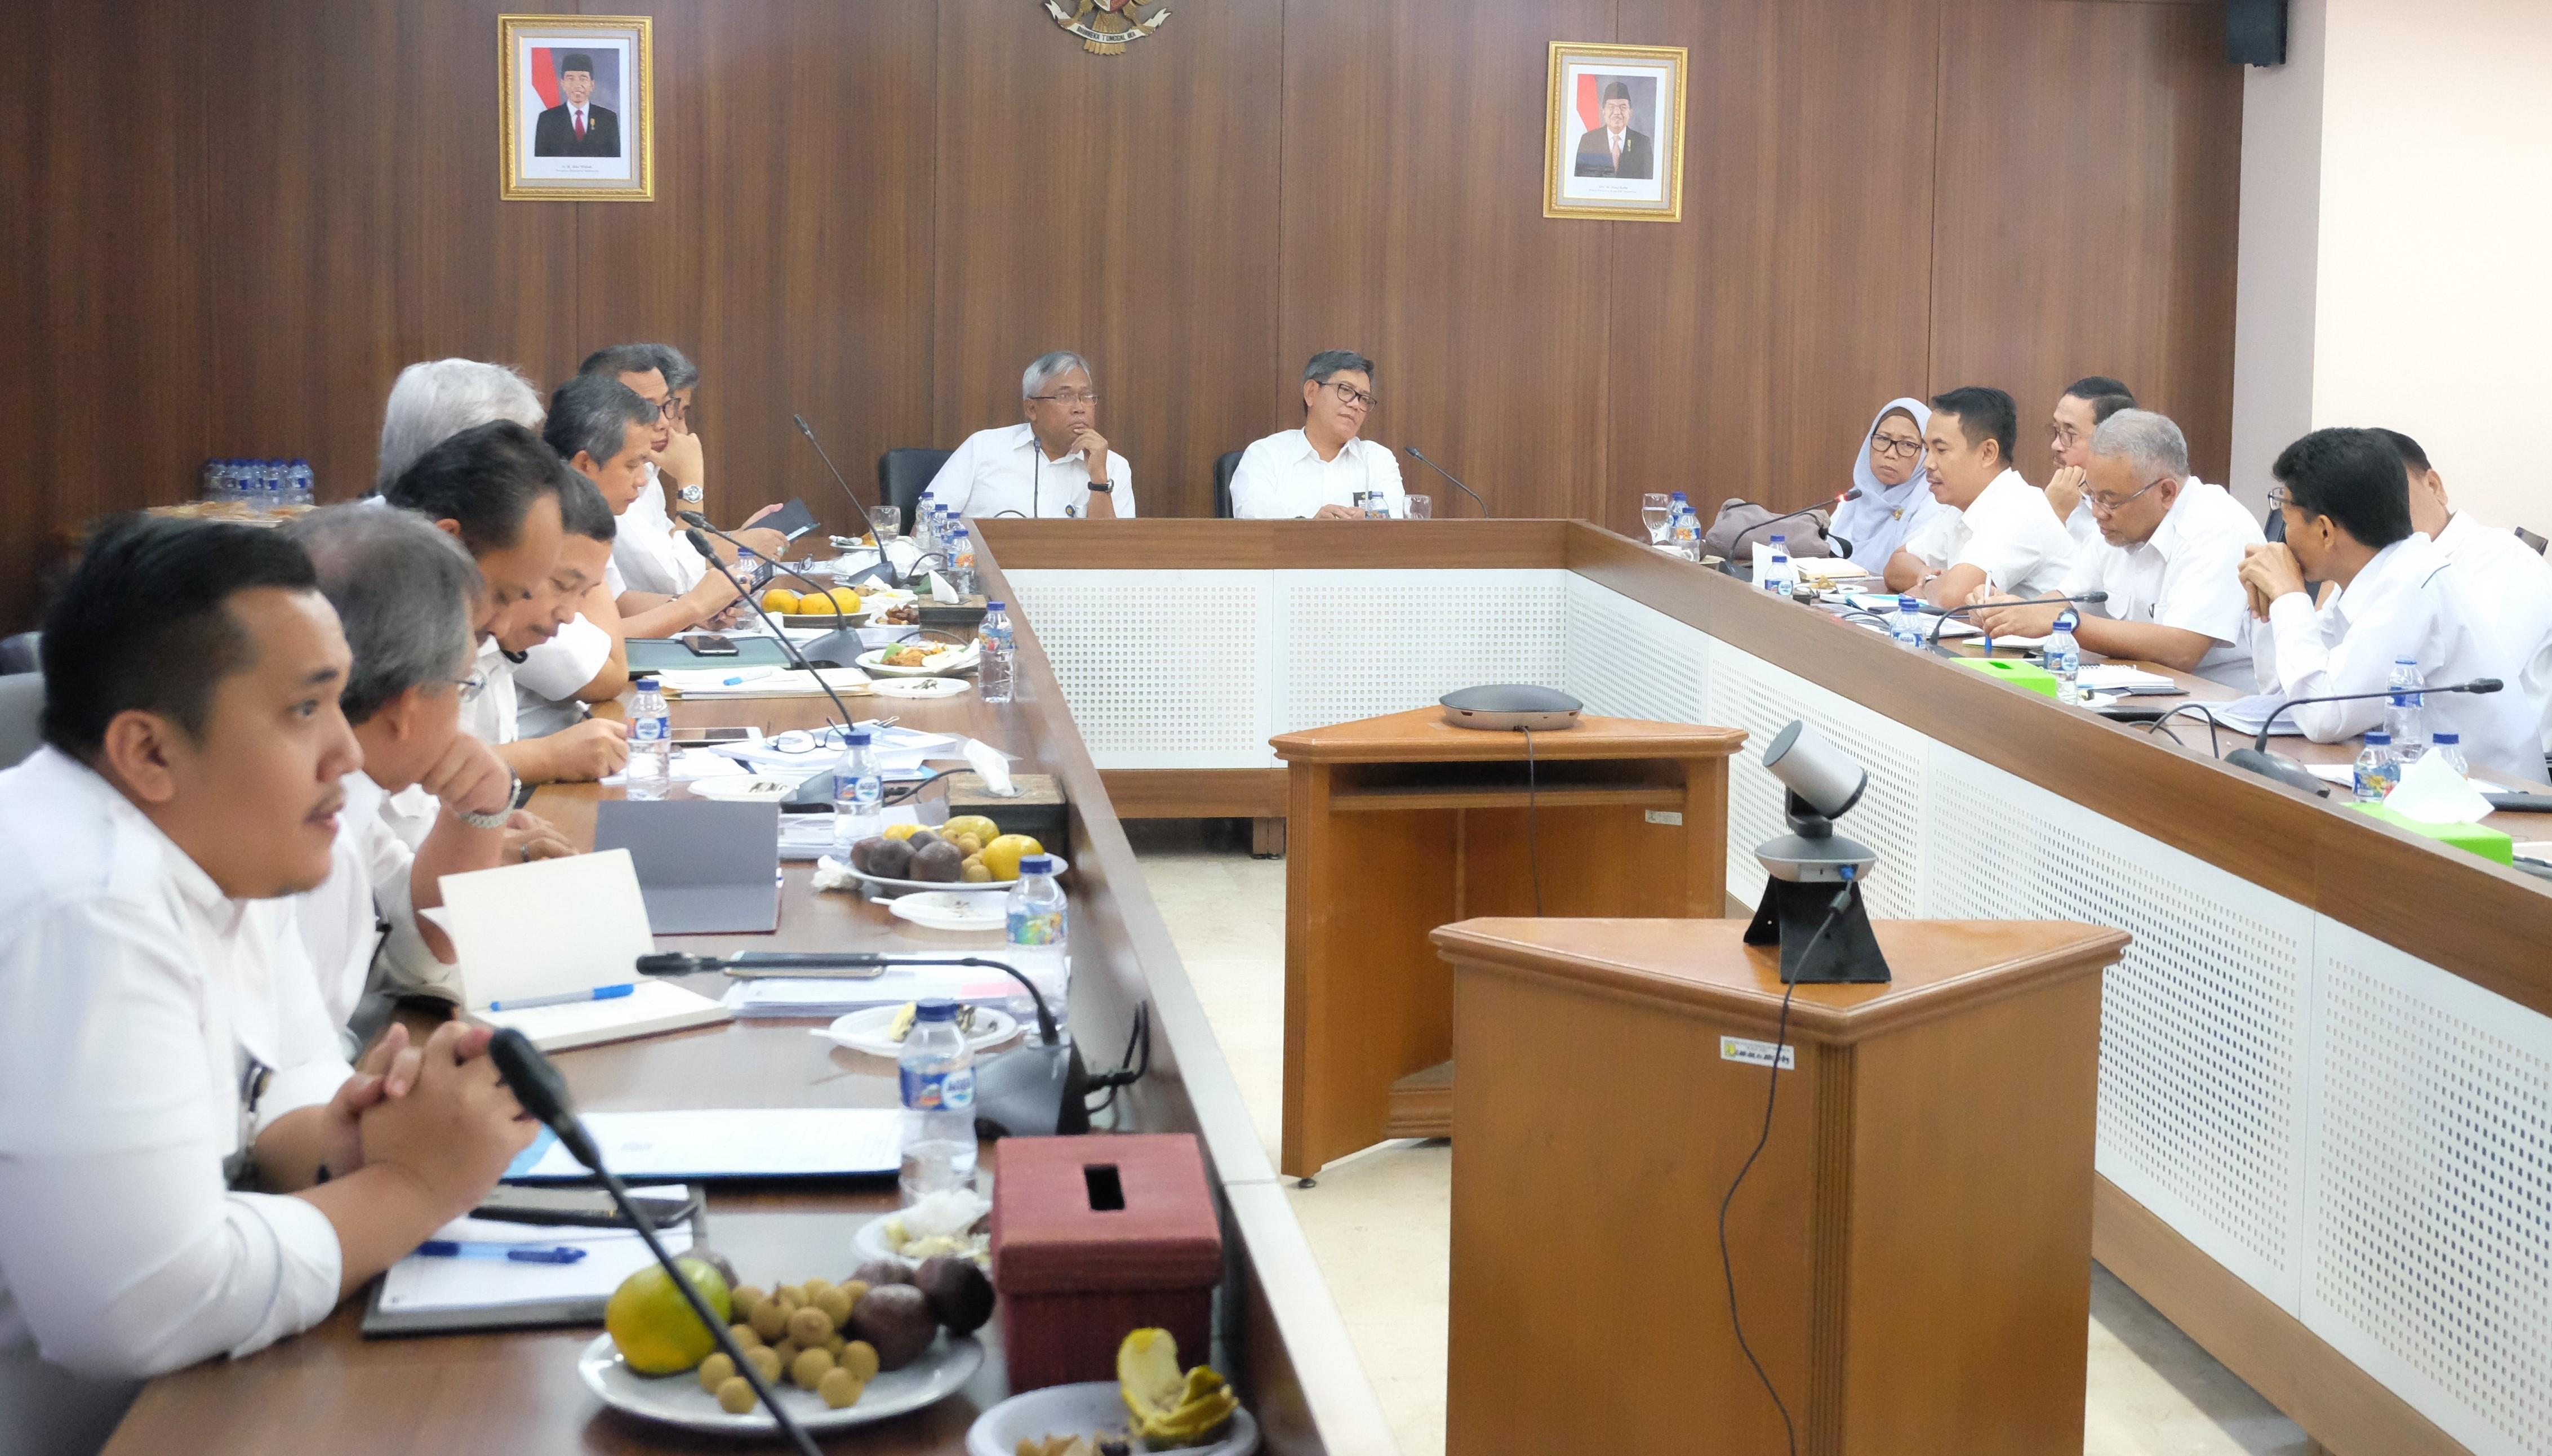 Kunjungi Cipta Karya, Kepala BPIW Bahas Keterpaduan Perencanaan Infrastruktur